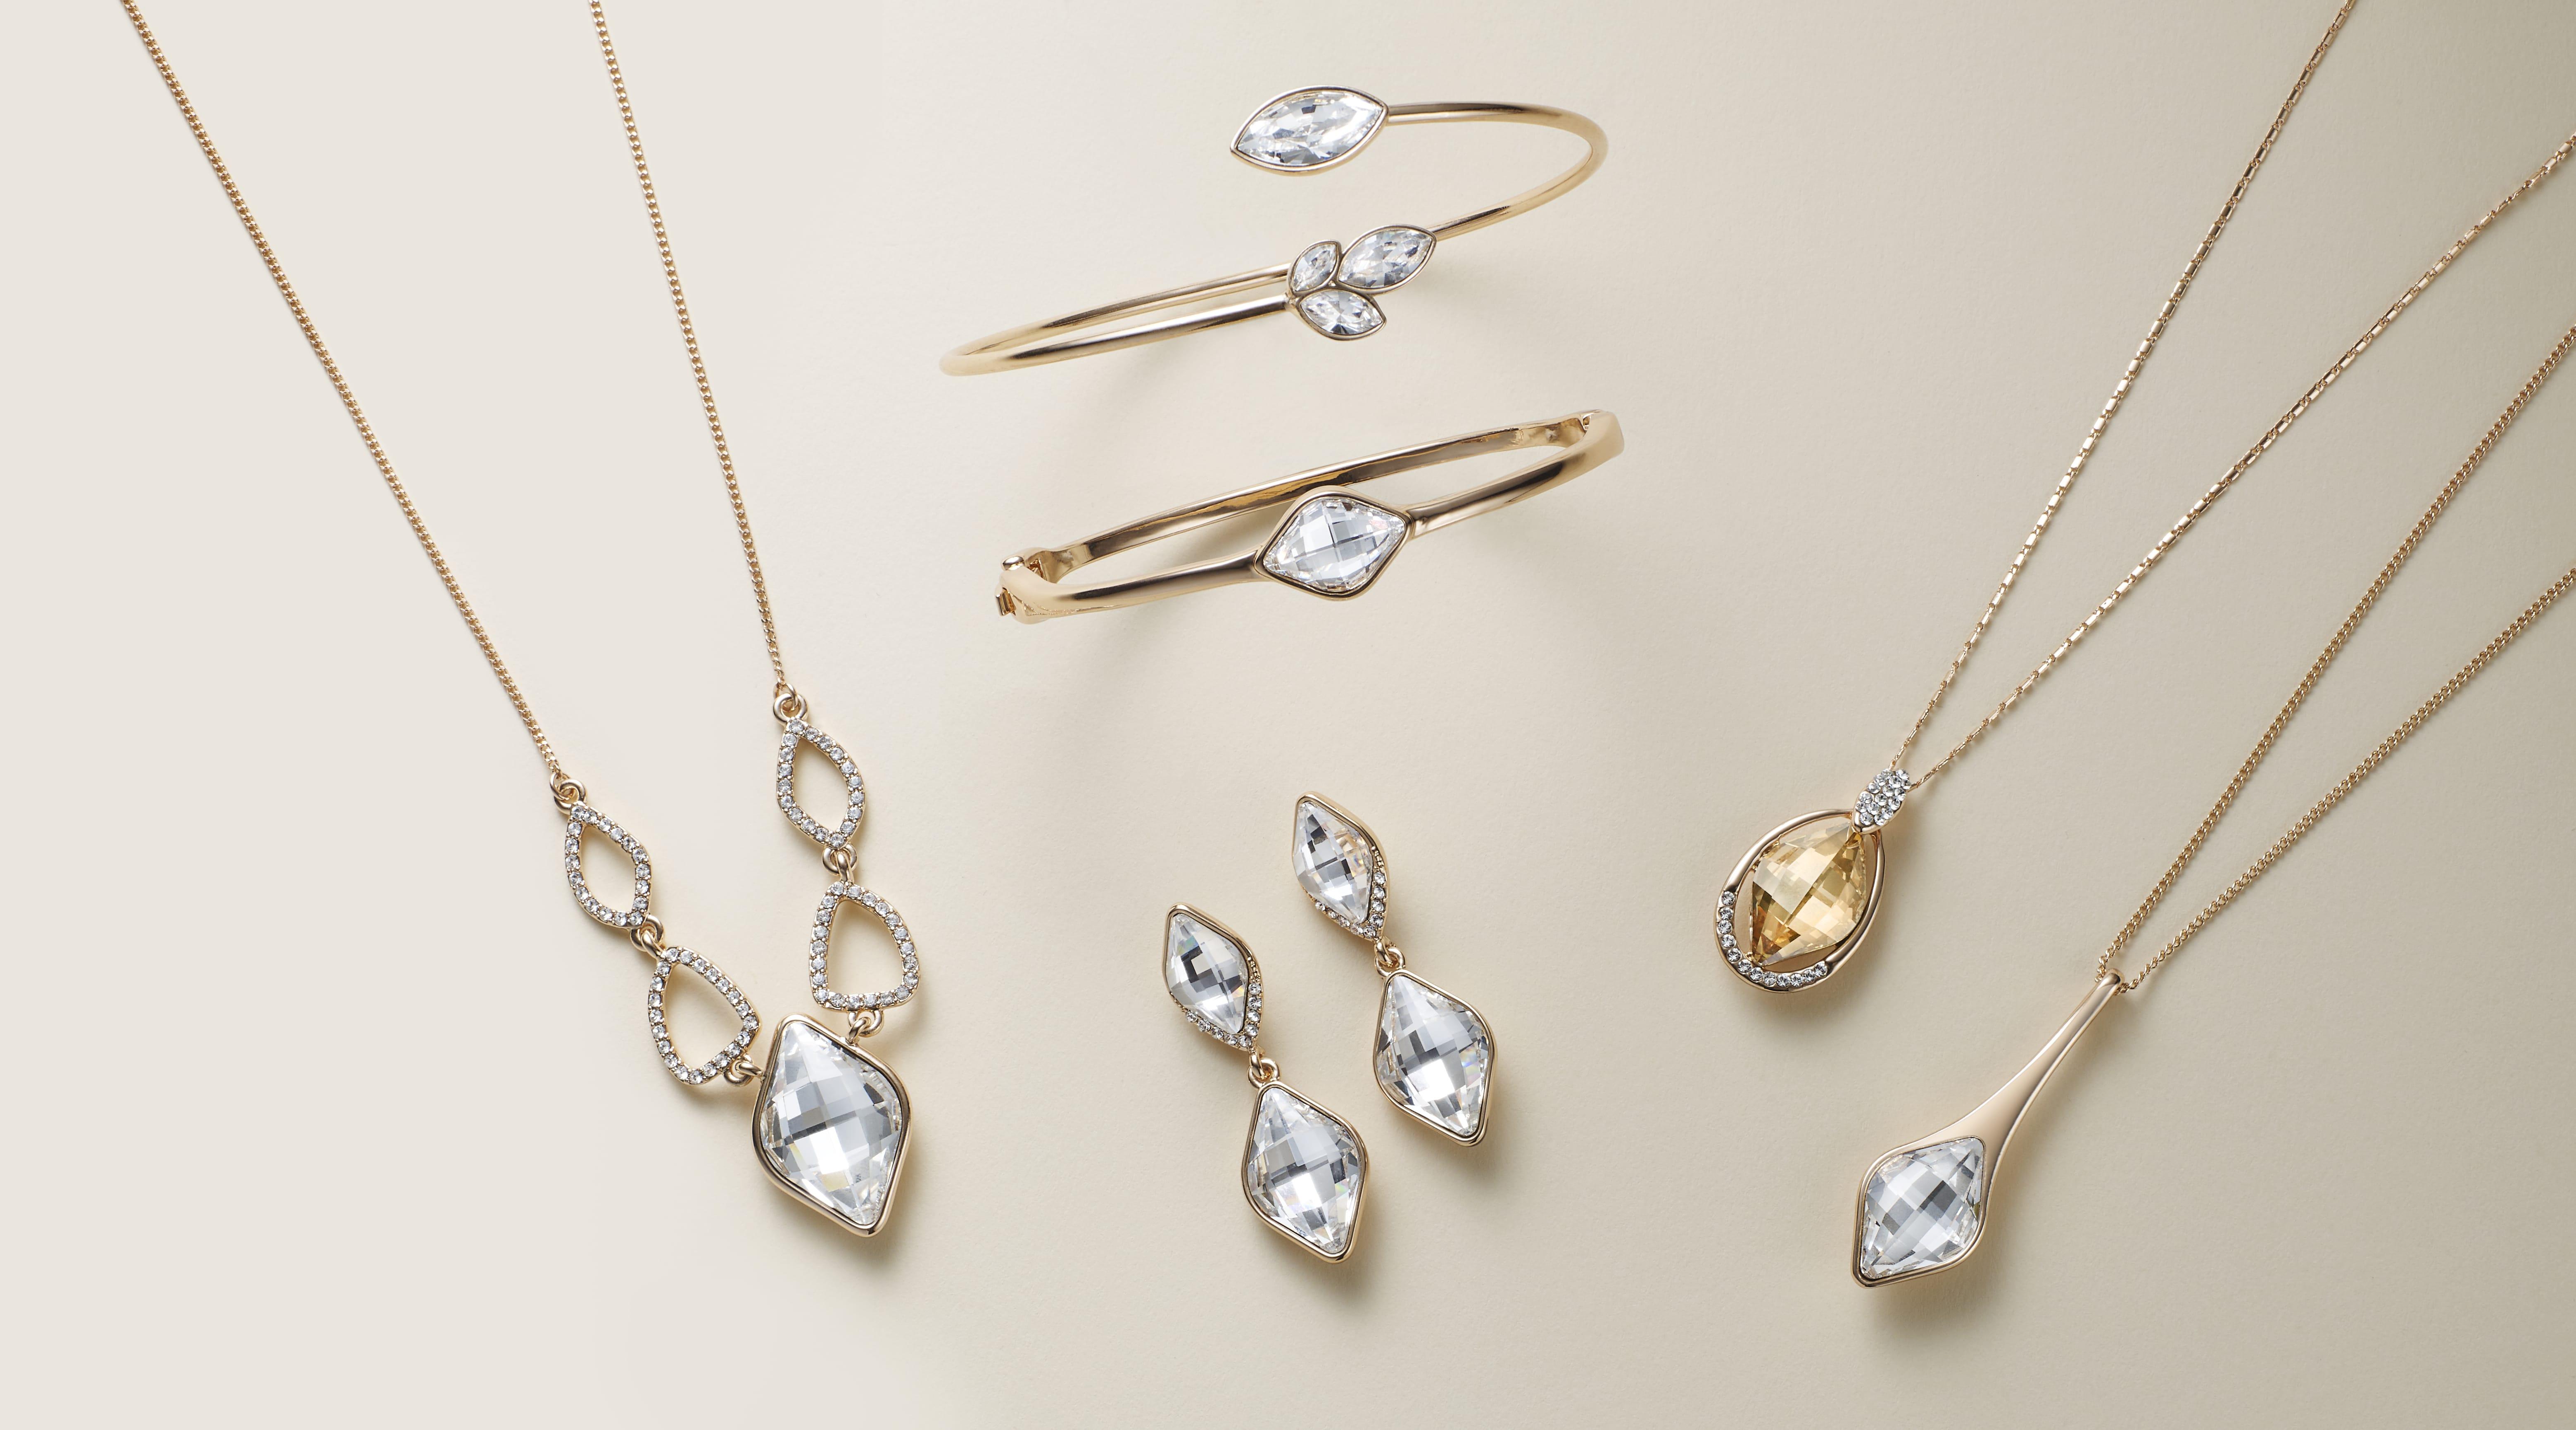 5429615c6800 Swarovski crystal jewellery necklace bracelet and earrings